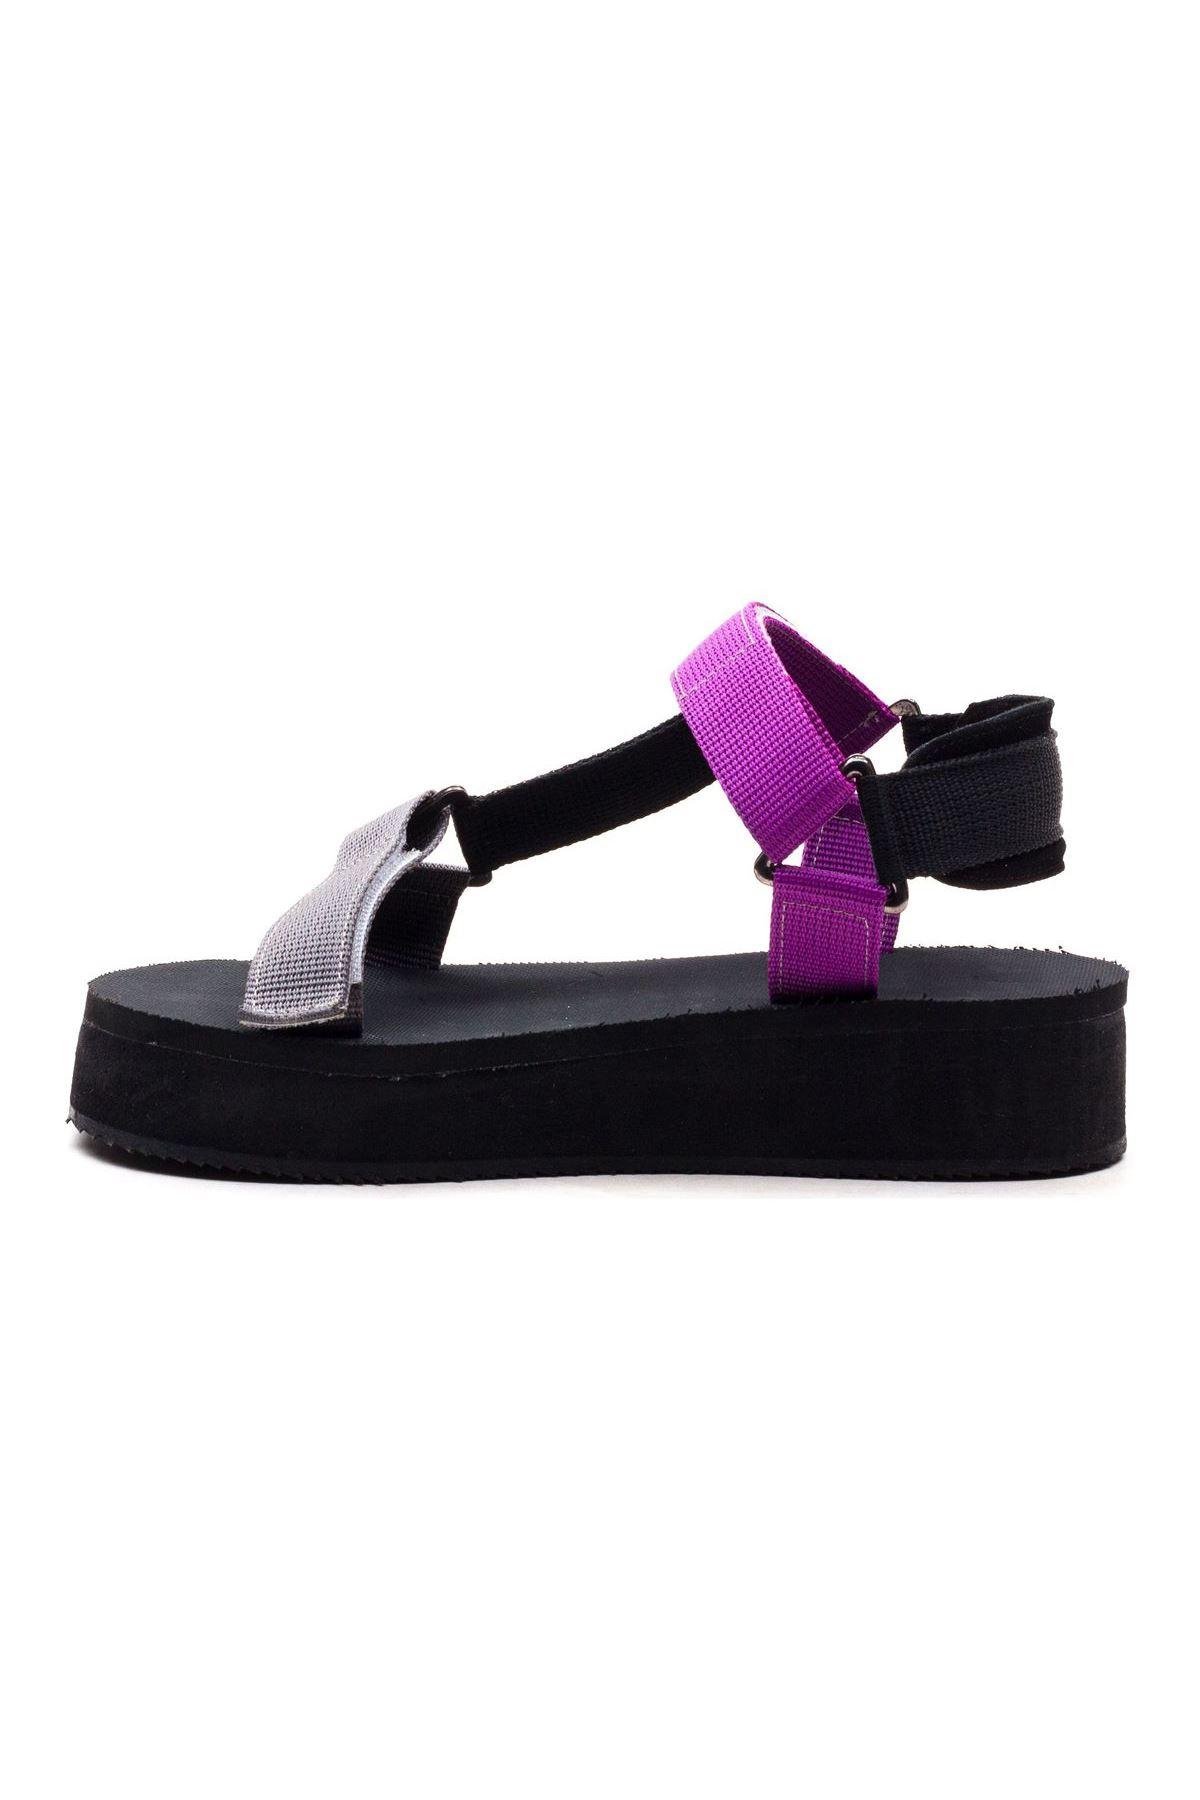 Carolina Kadın Sandalet Siyah Lila Gri